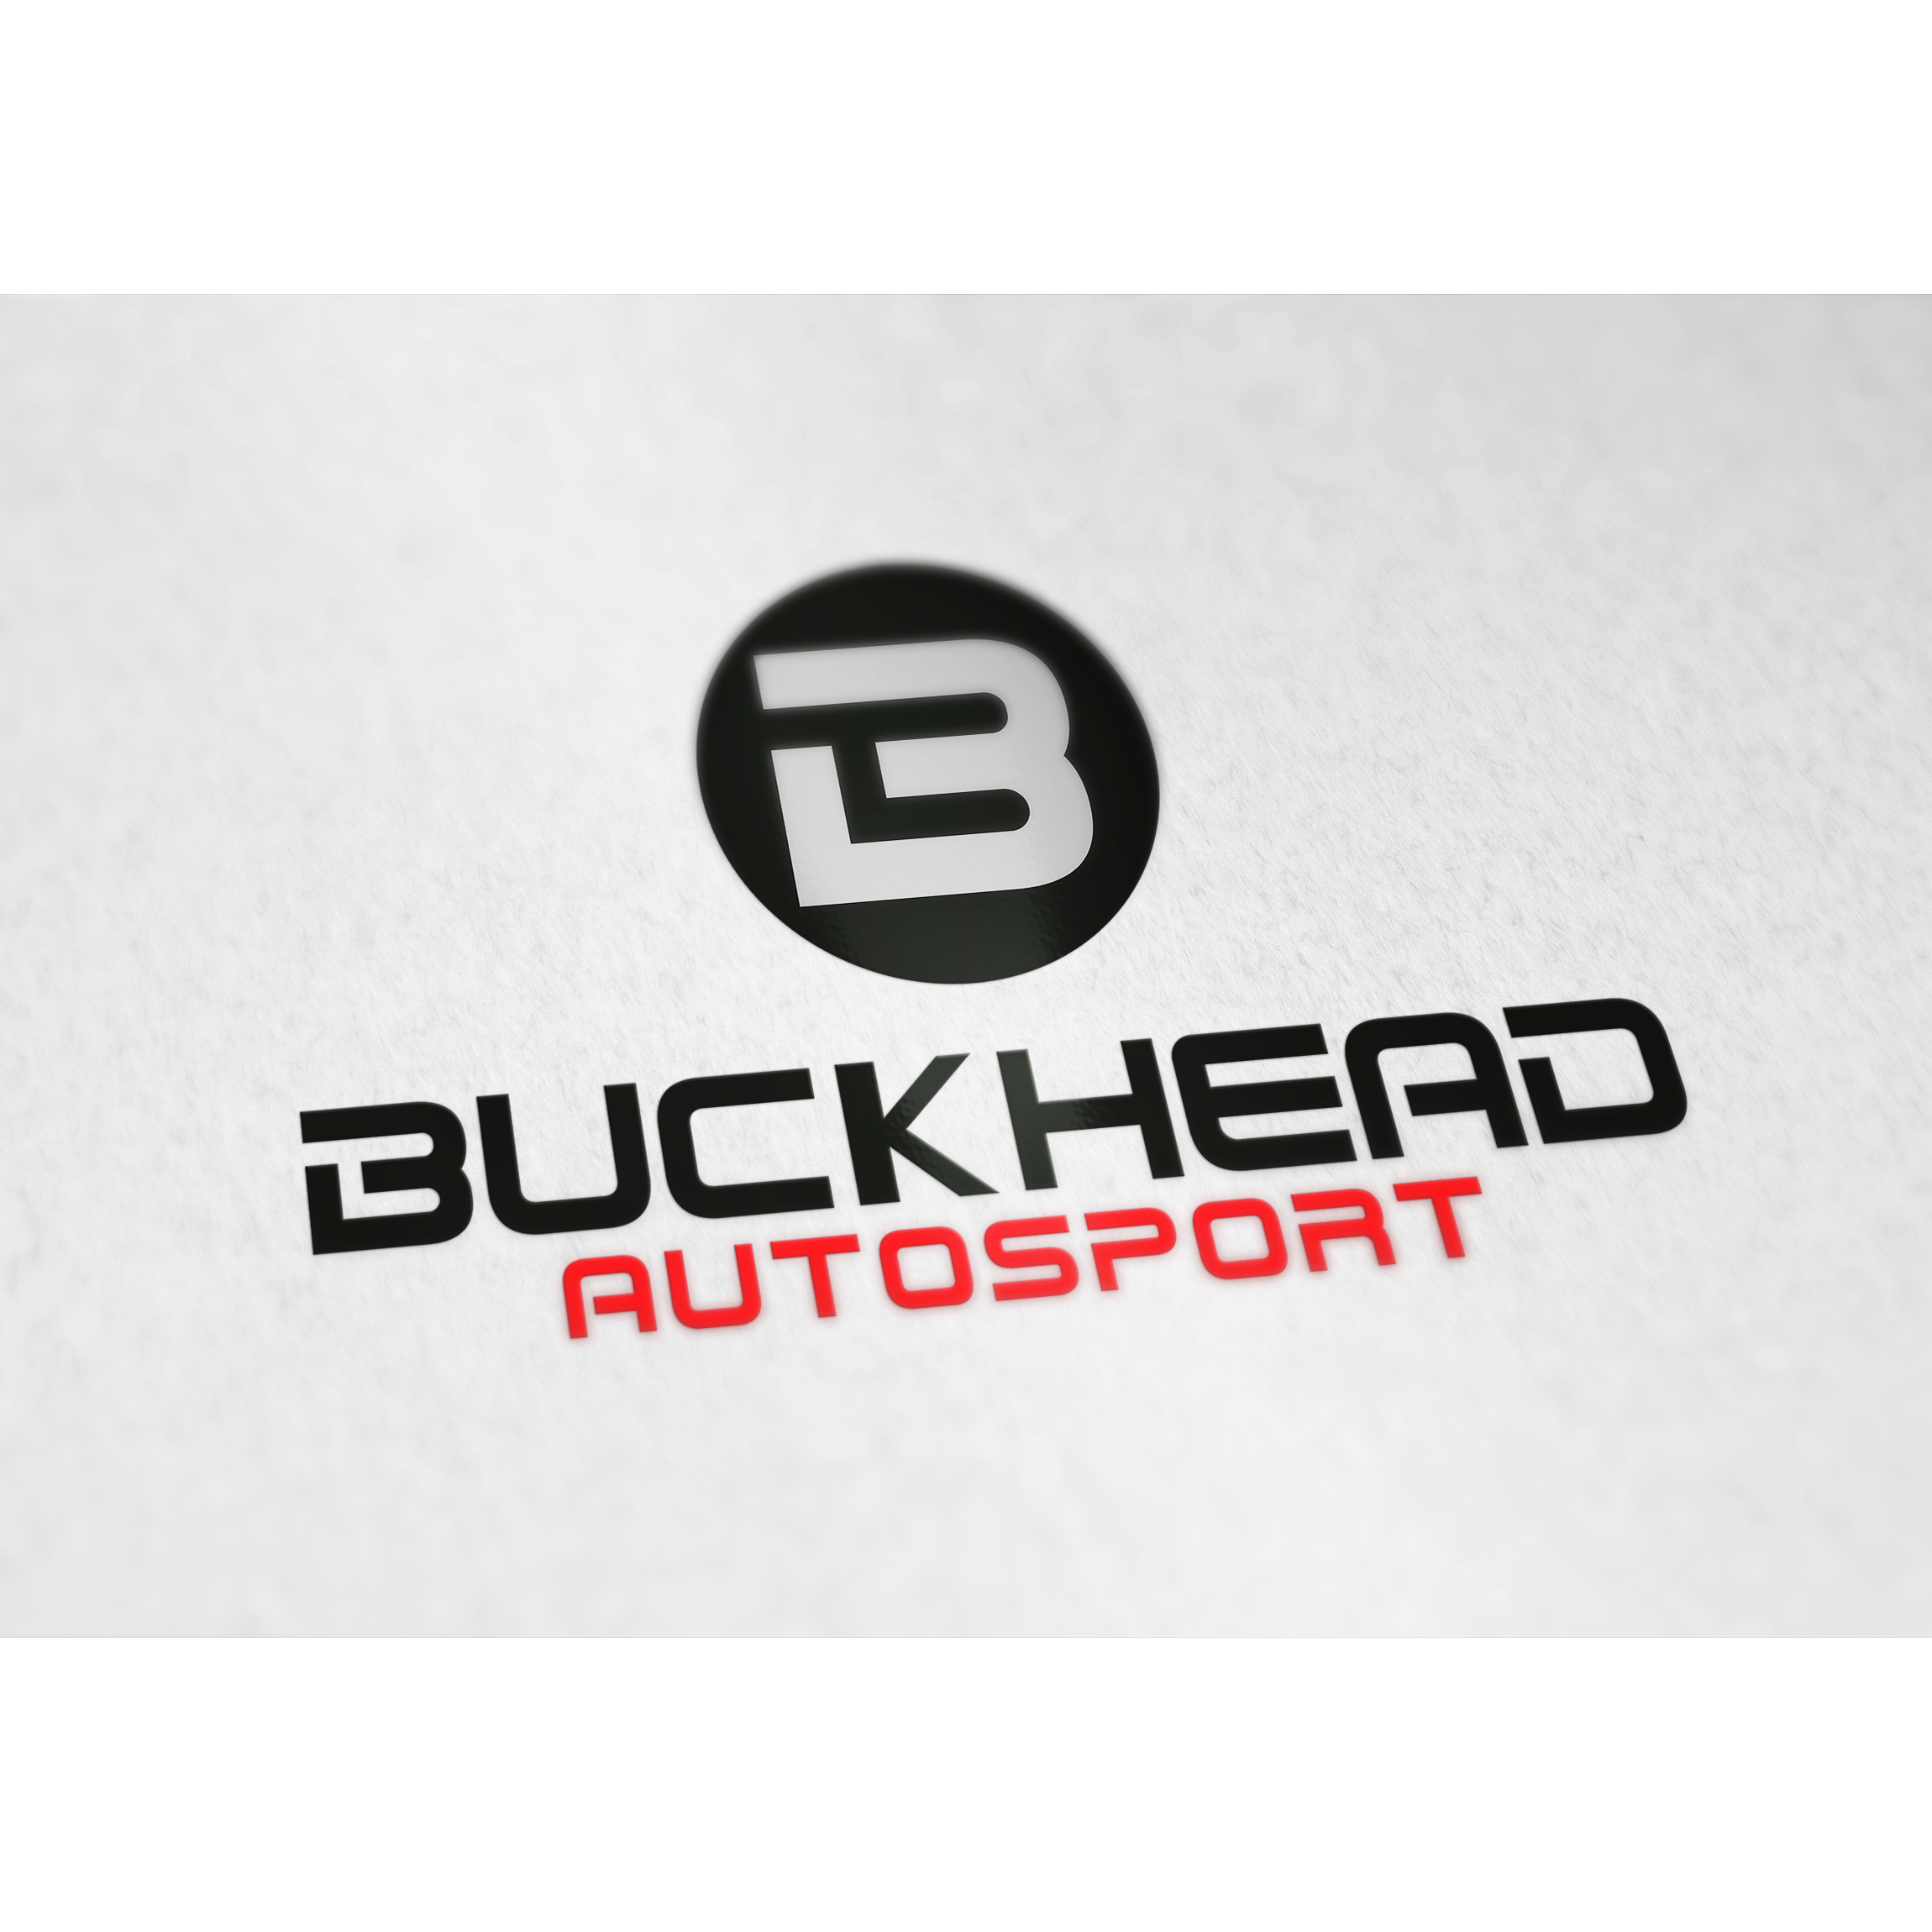 Stephen Adams - Buckhead Auto Sport